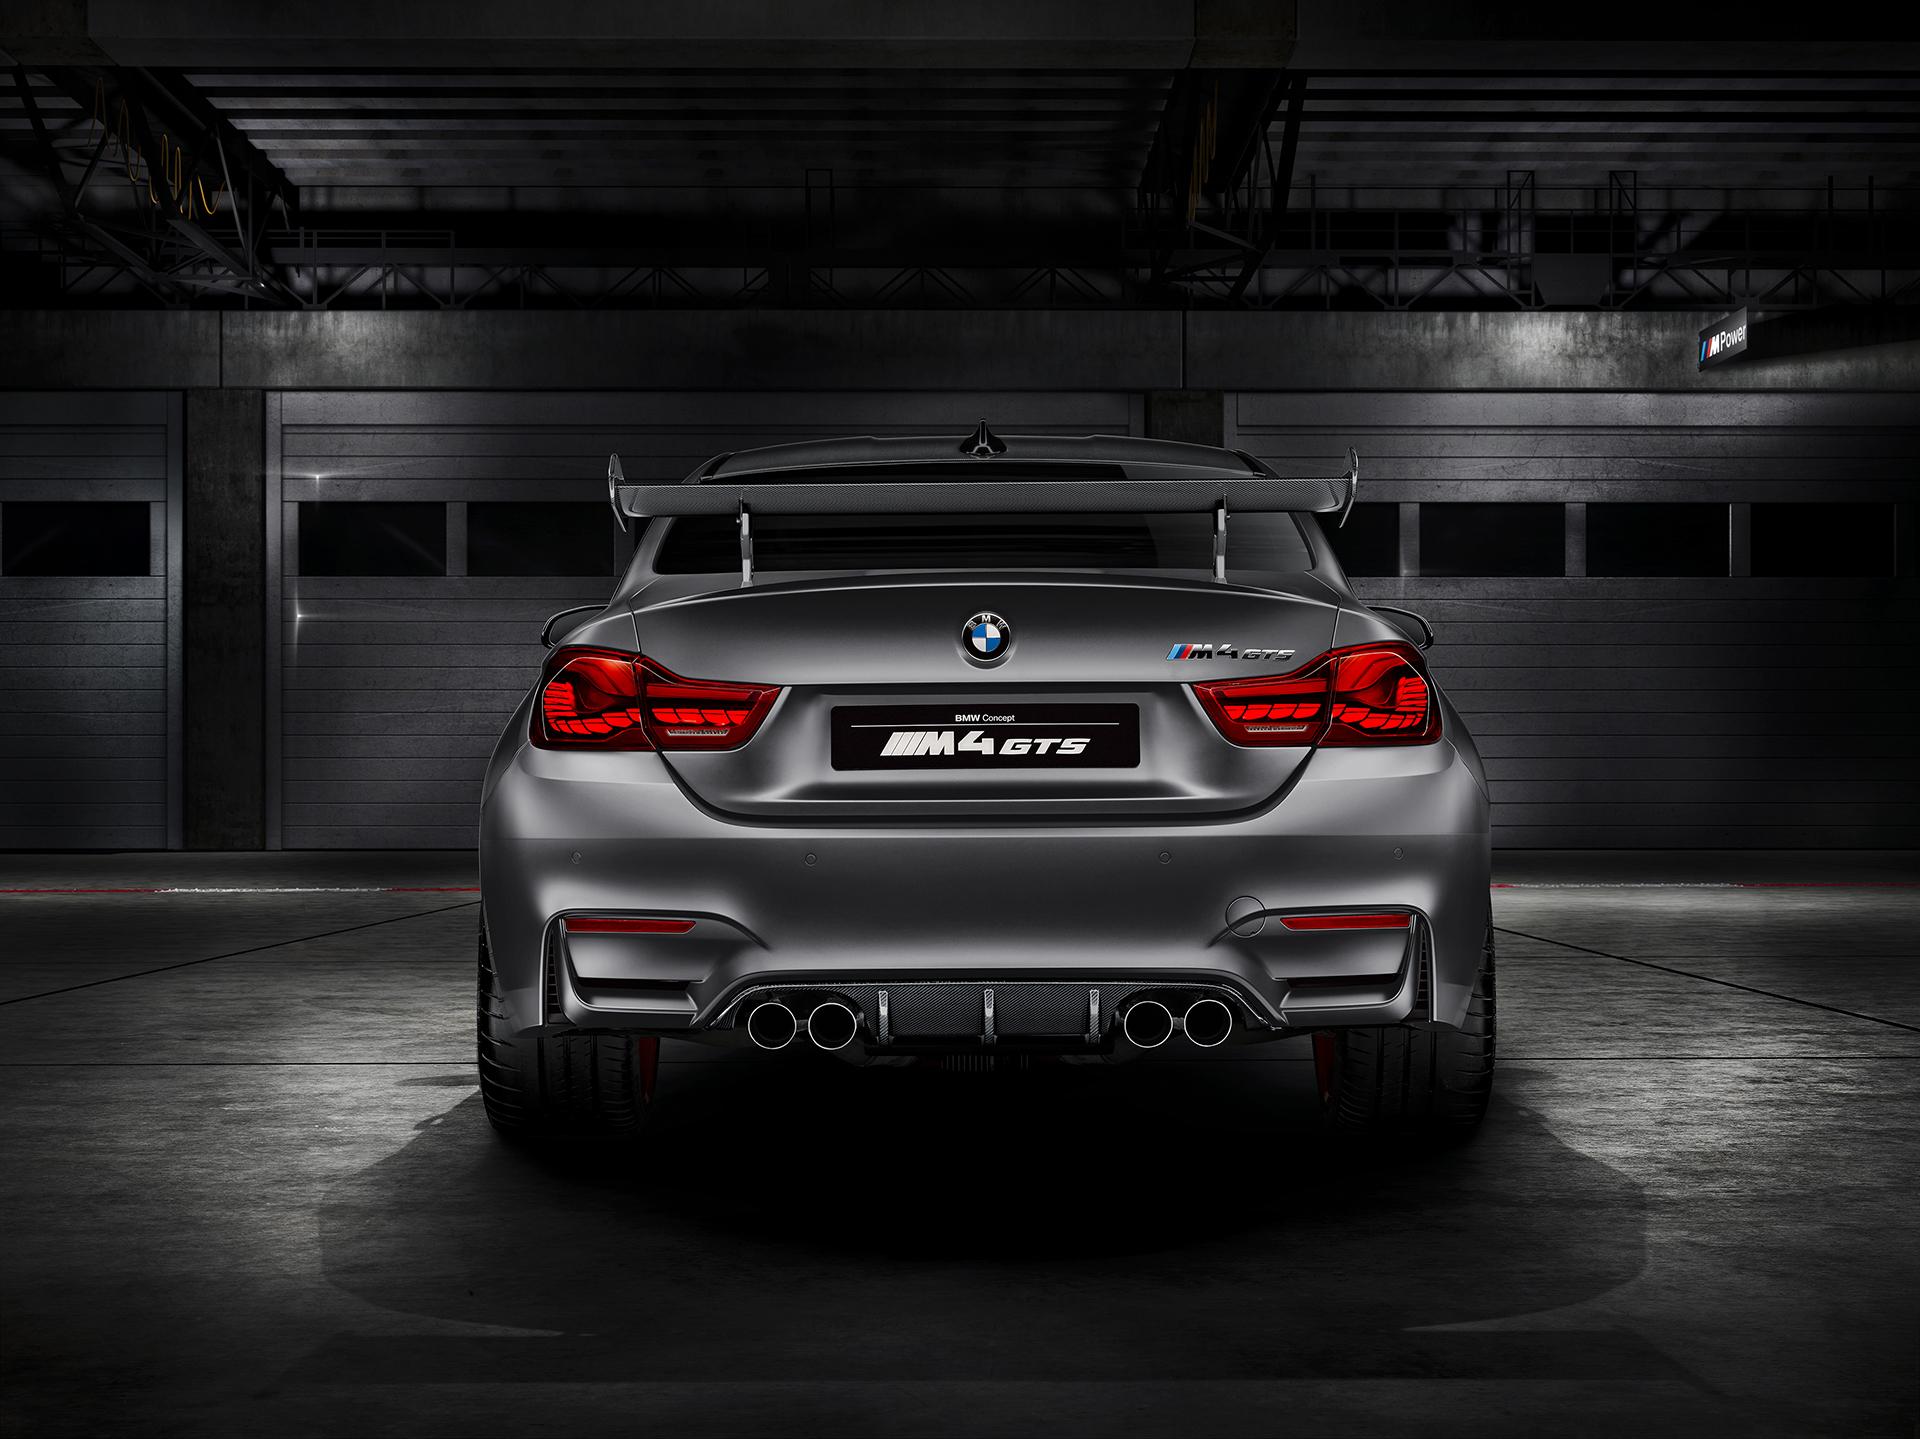 BMW M4 GTS - arrière / rear